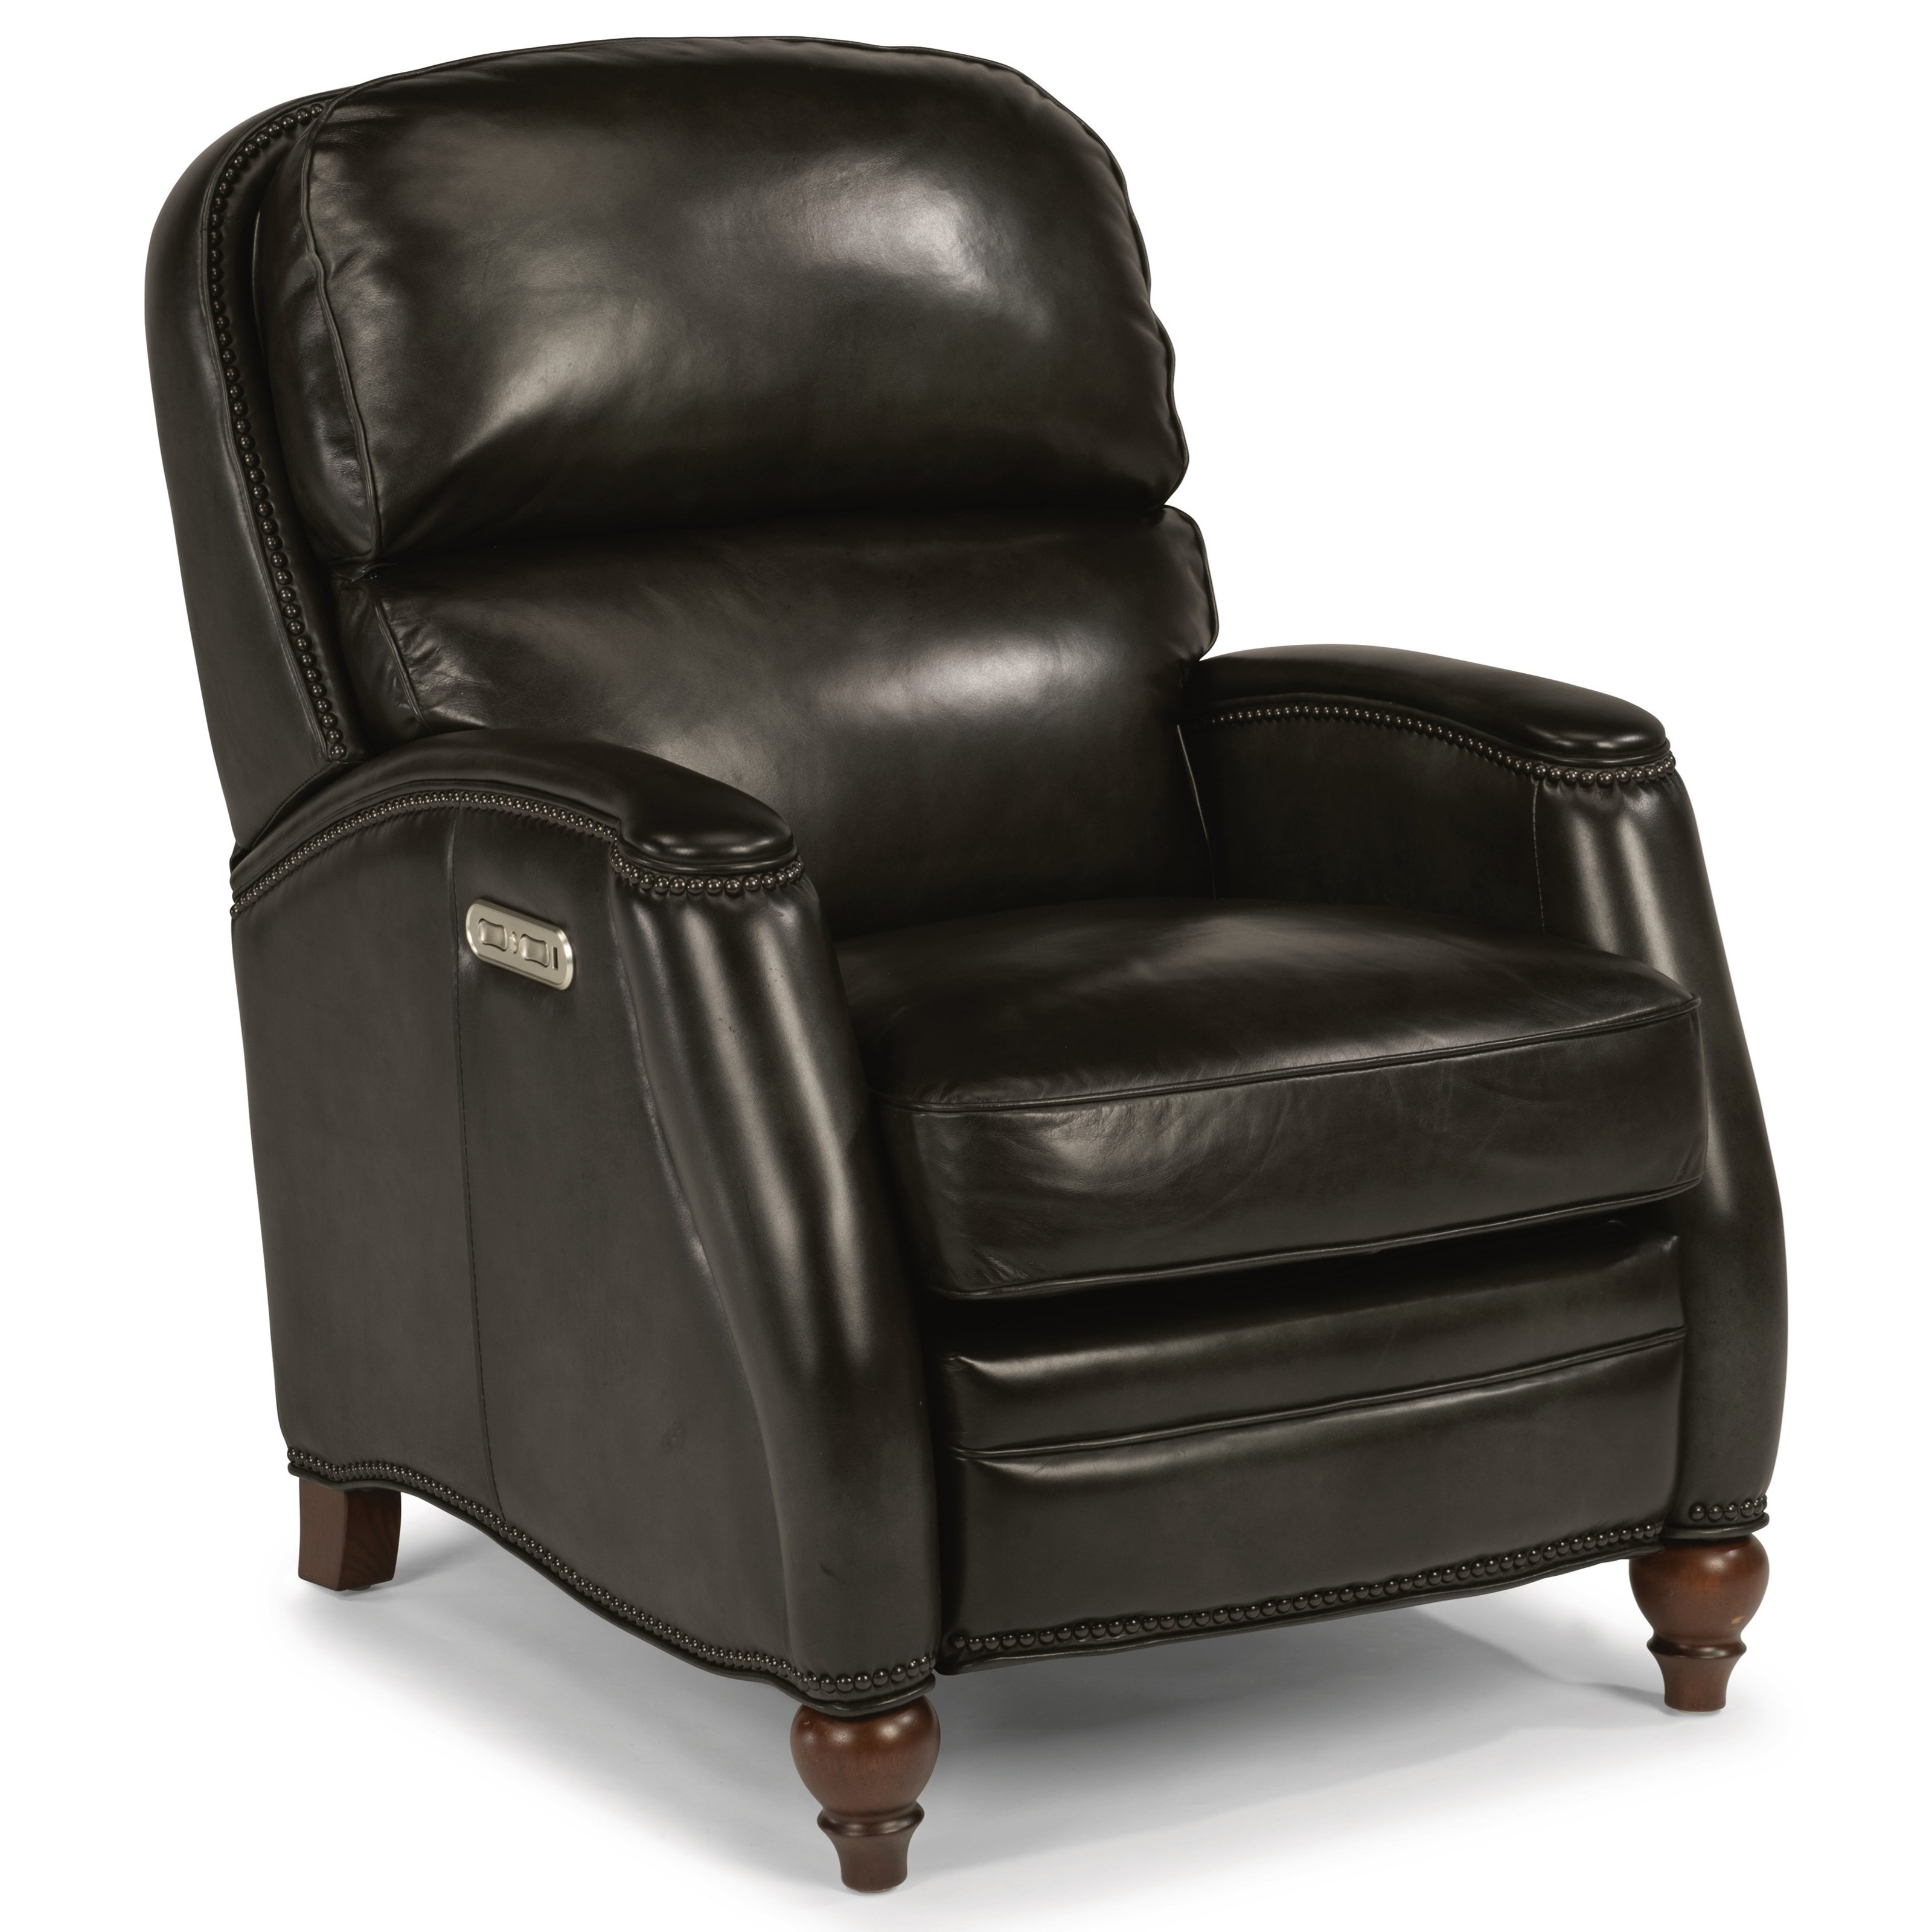 Flexsteel Electric Sofa: Everett Transitional Power High-Leg